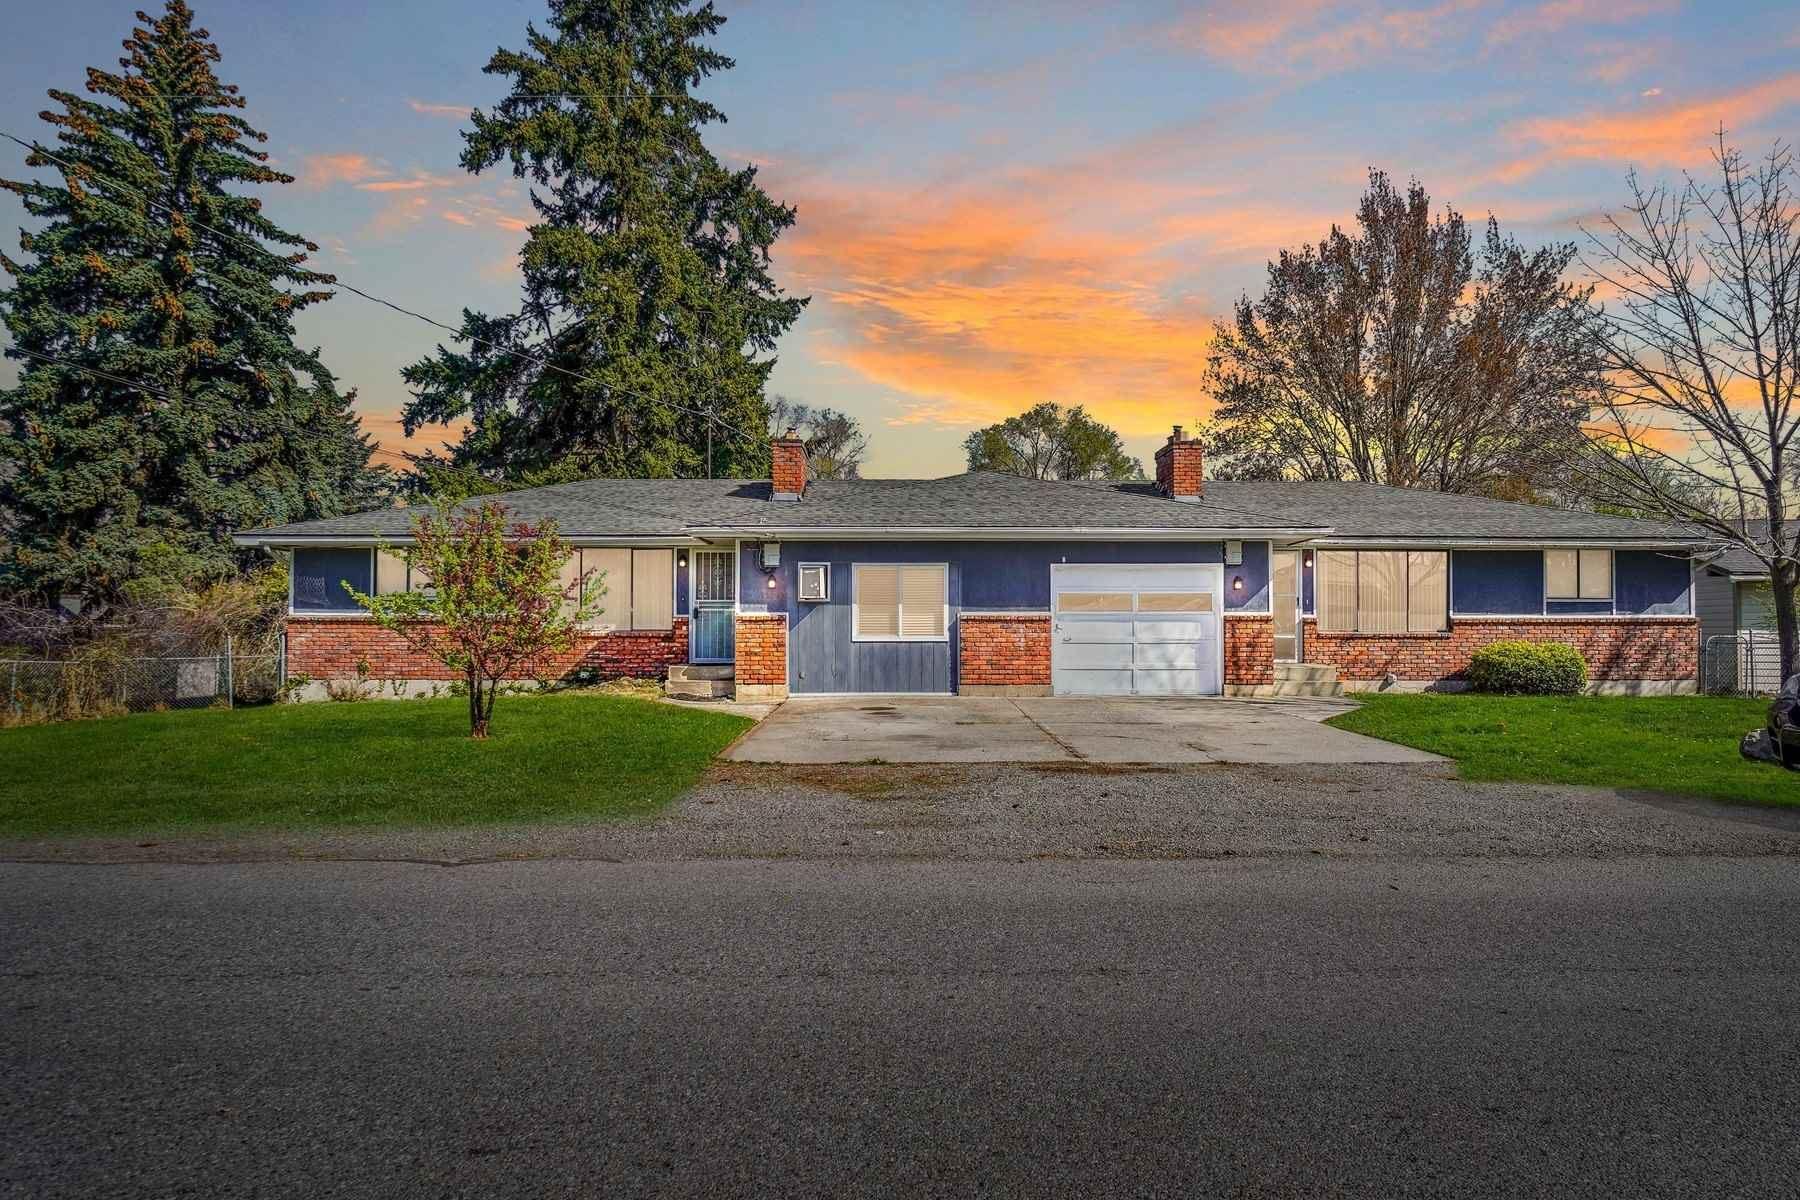 11903 E MAXWELL Ave, Spokane Valley, WA 99206 - #: 202114309